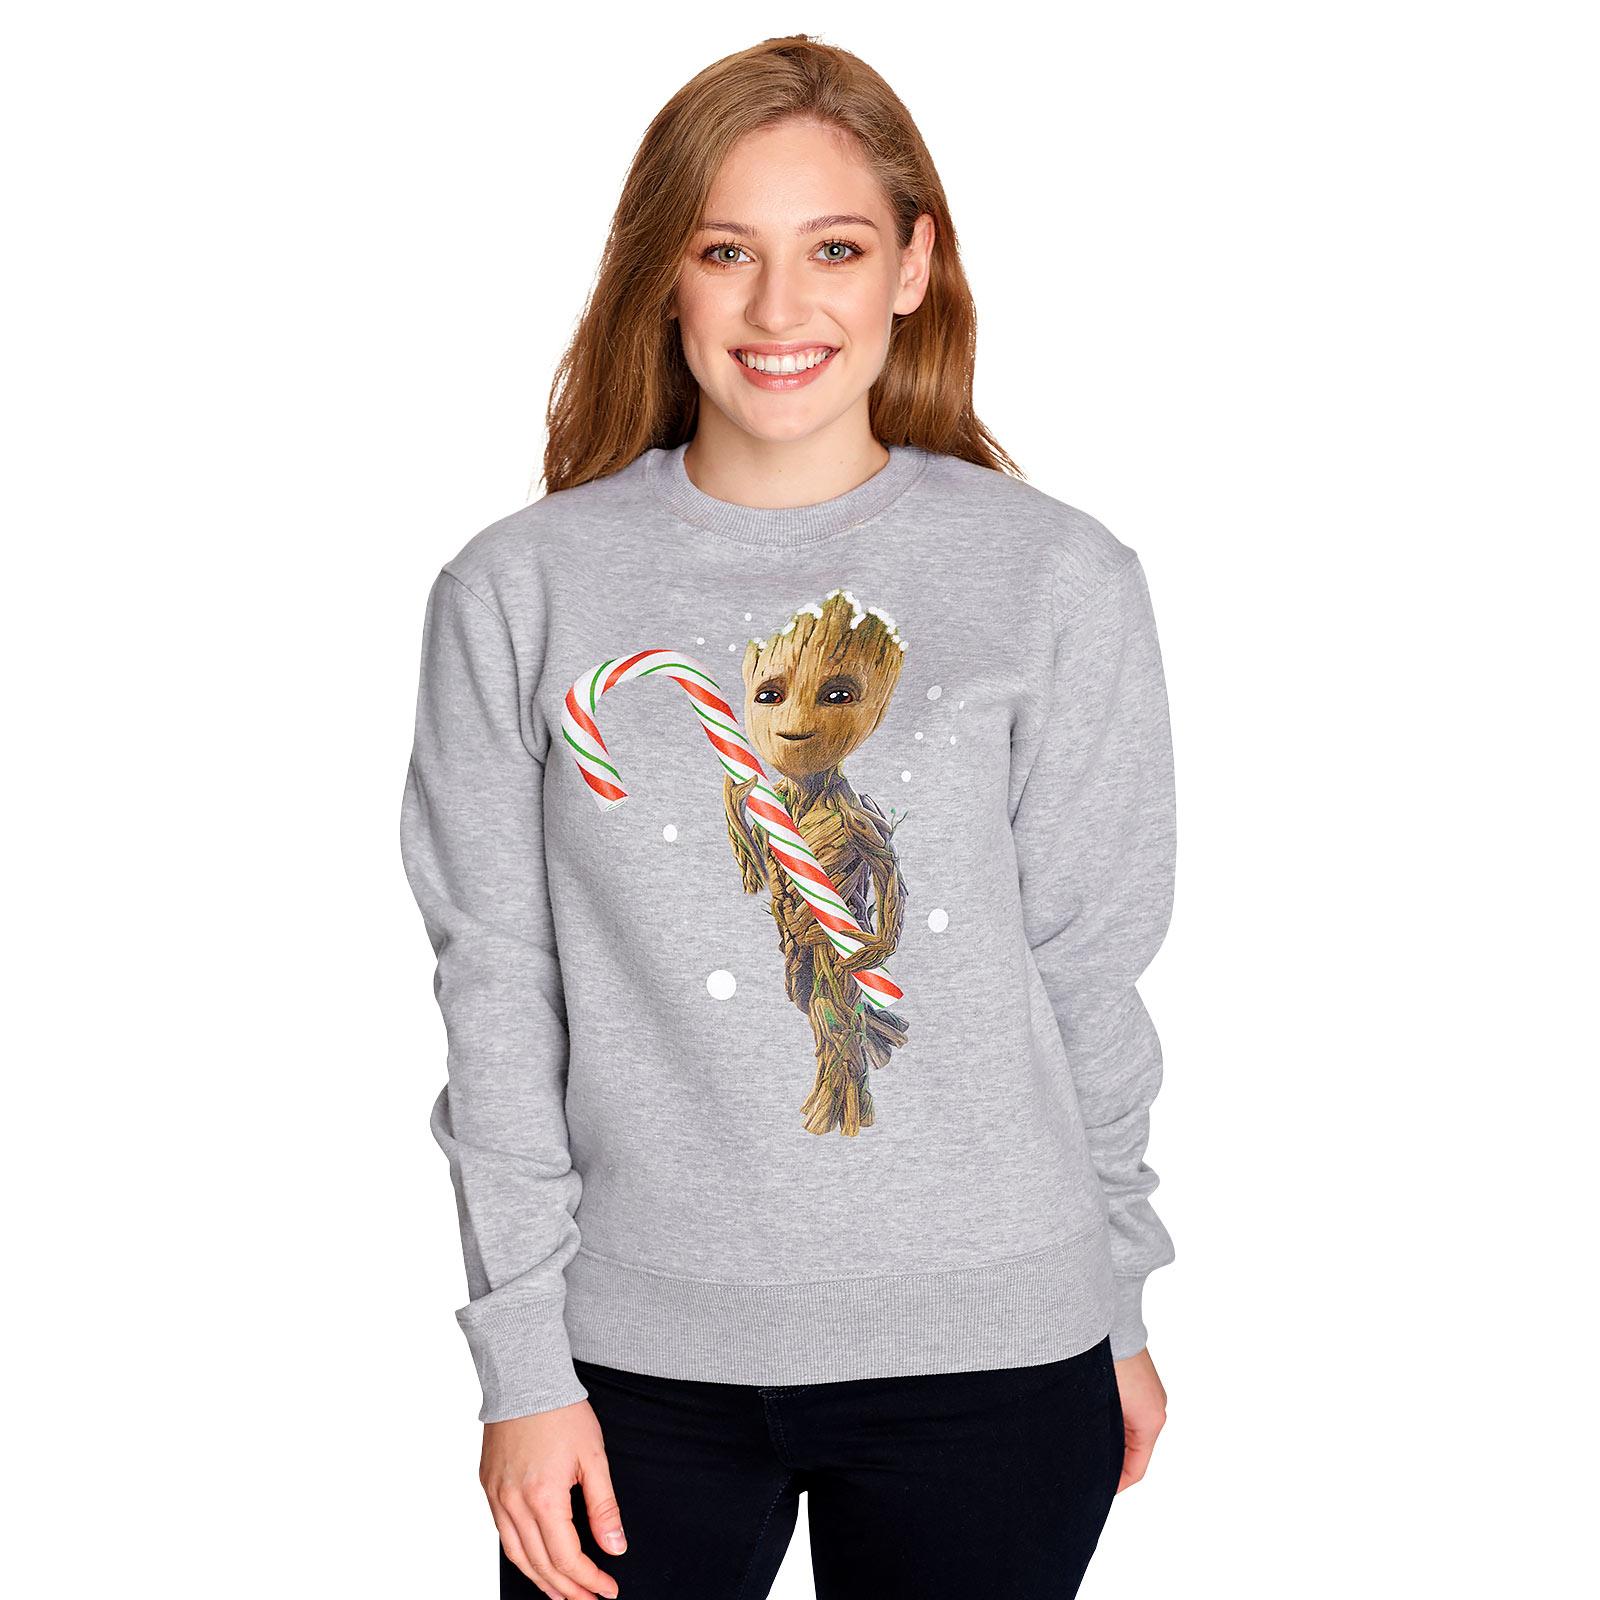 Guardians of the Galaxy - Groot mit Zuckerstange Sweater grau